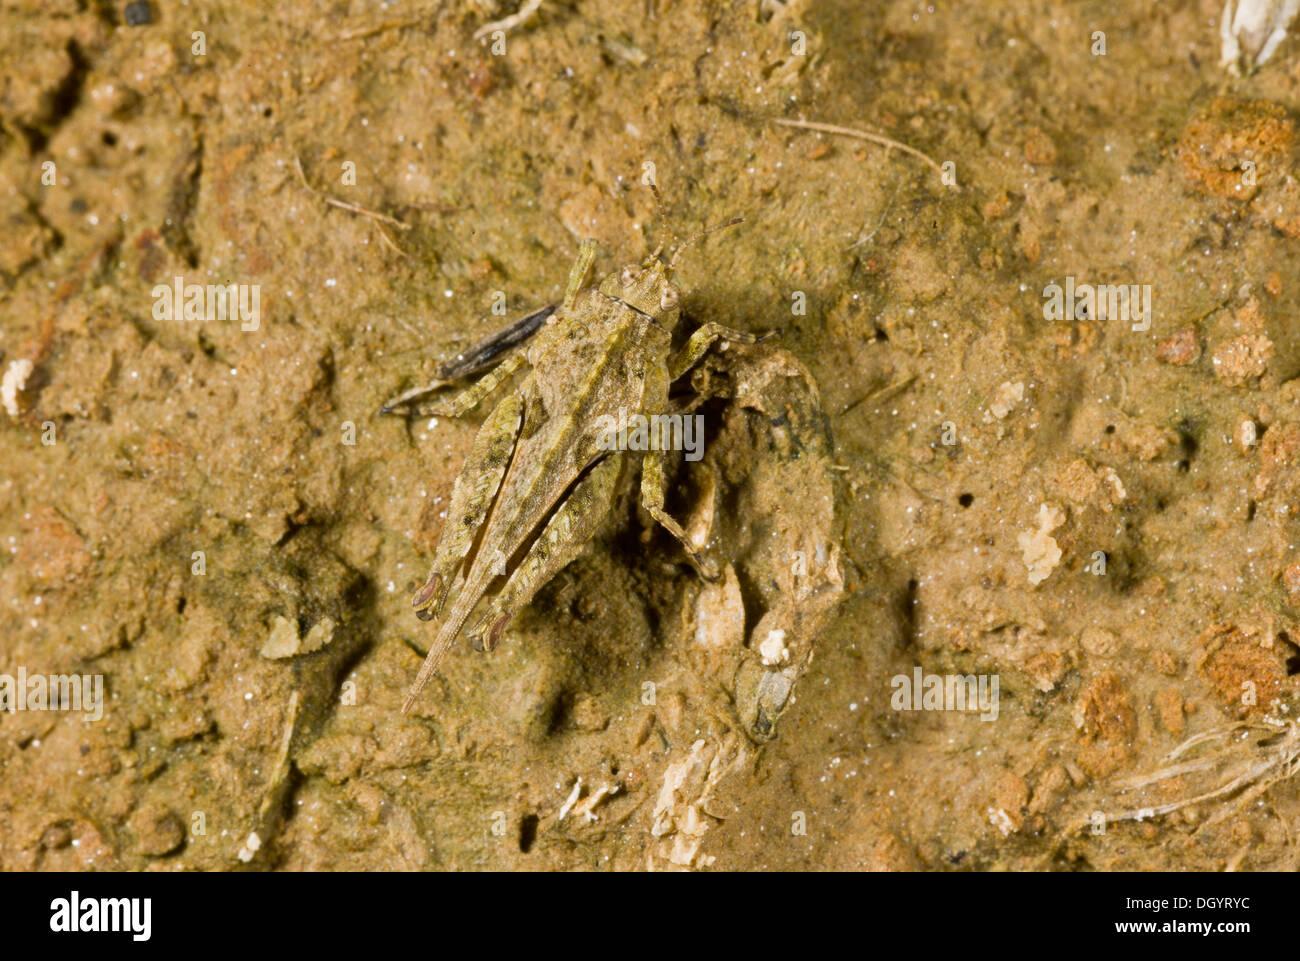 Cepero's Groundhopper, Tetrix ceperoi on muddy ground, undercliff, West Dorset. Rare in UK. - Stock Image